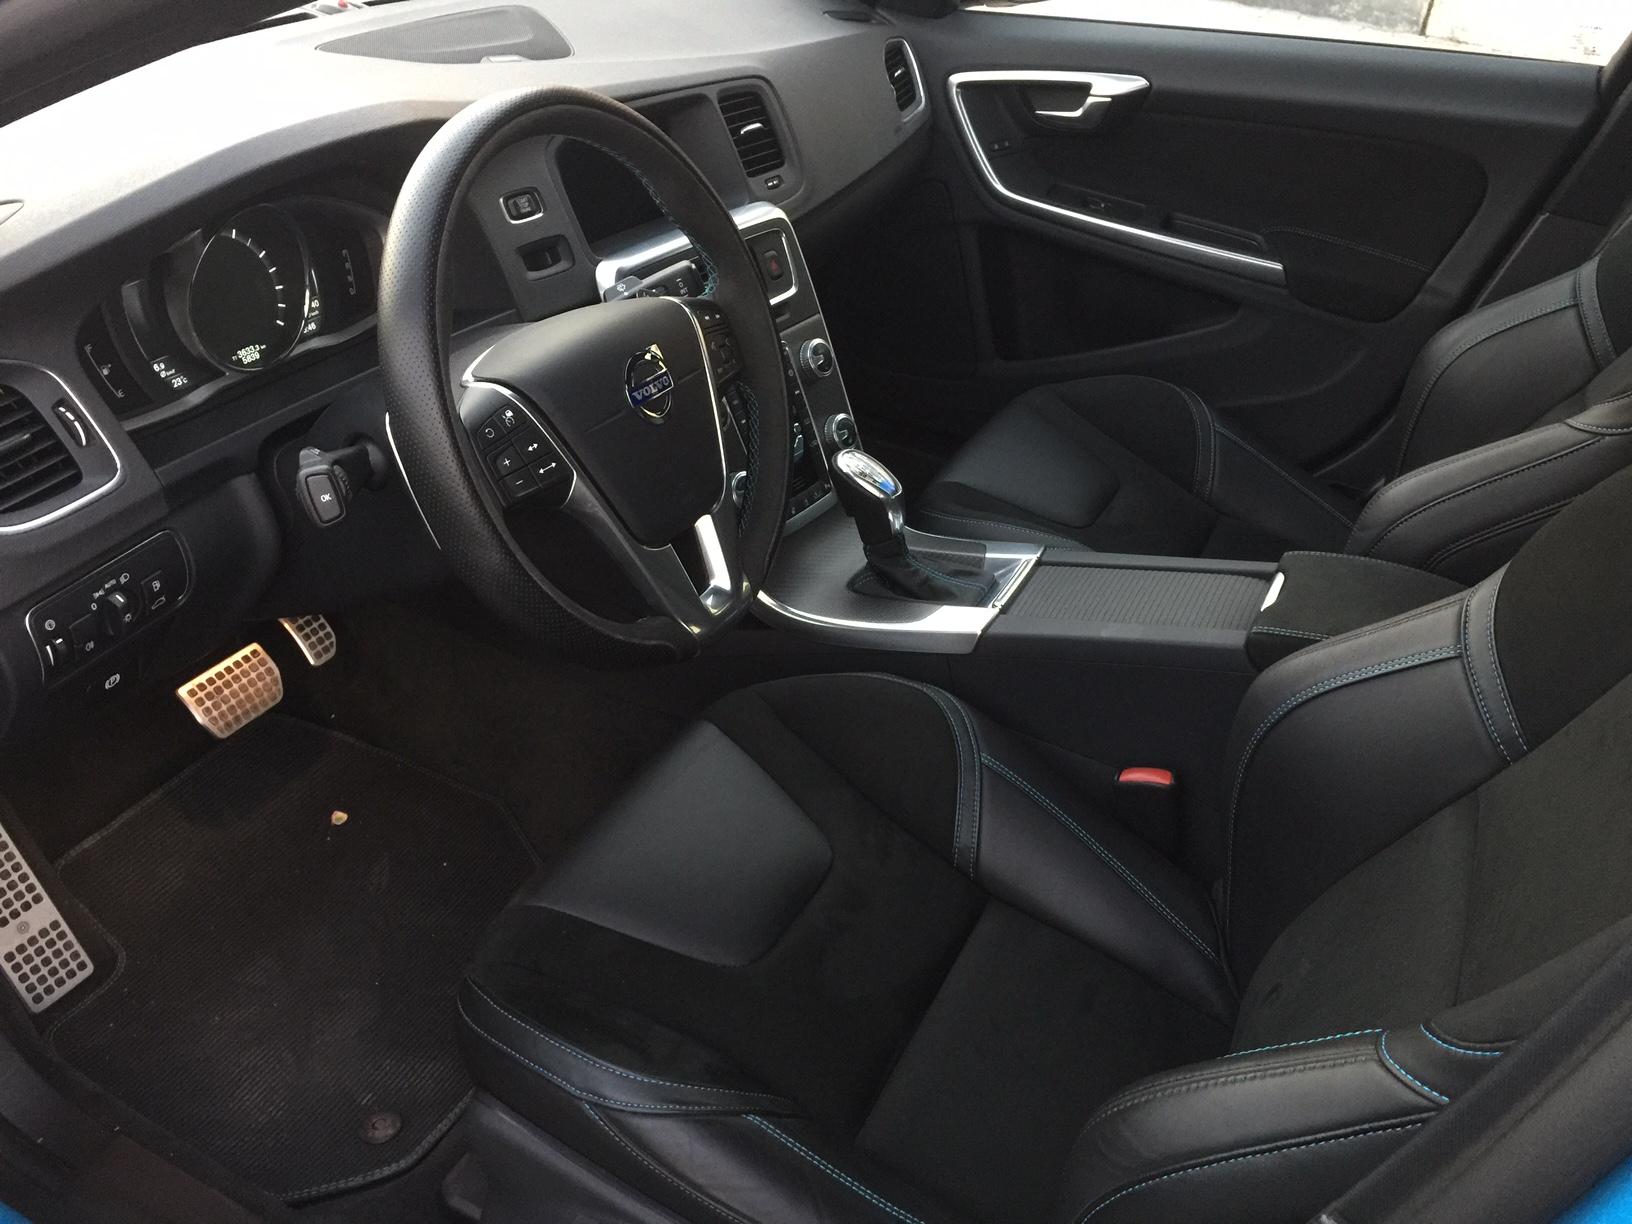 Volvo S60 T6 AWD Polestar - Interior